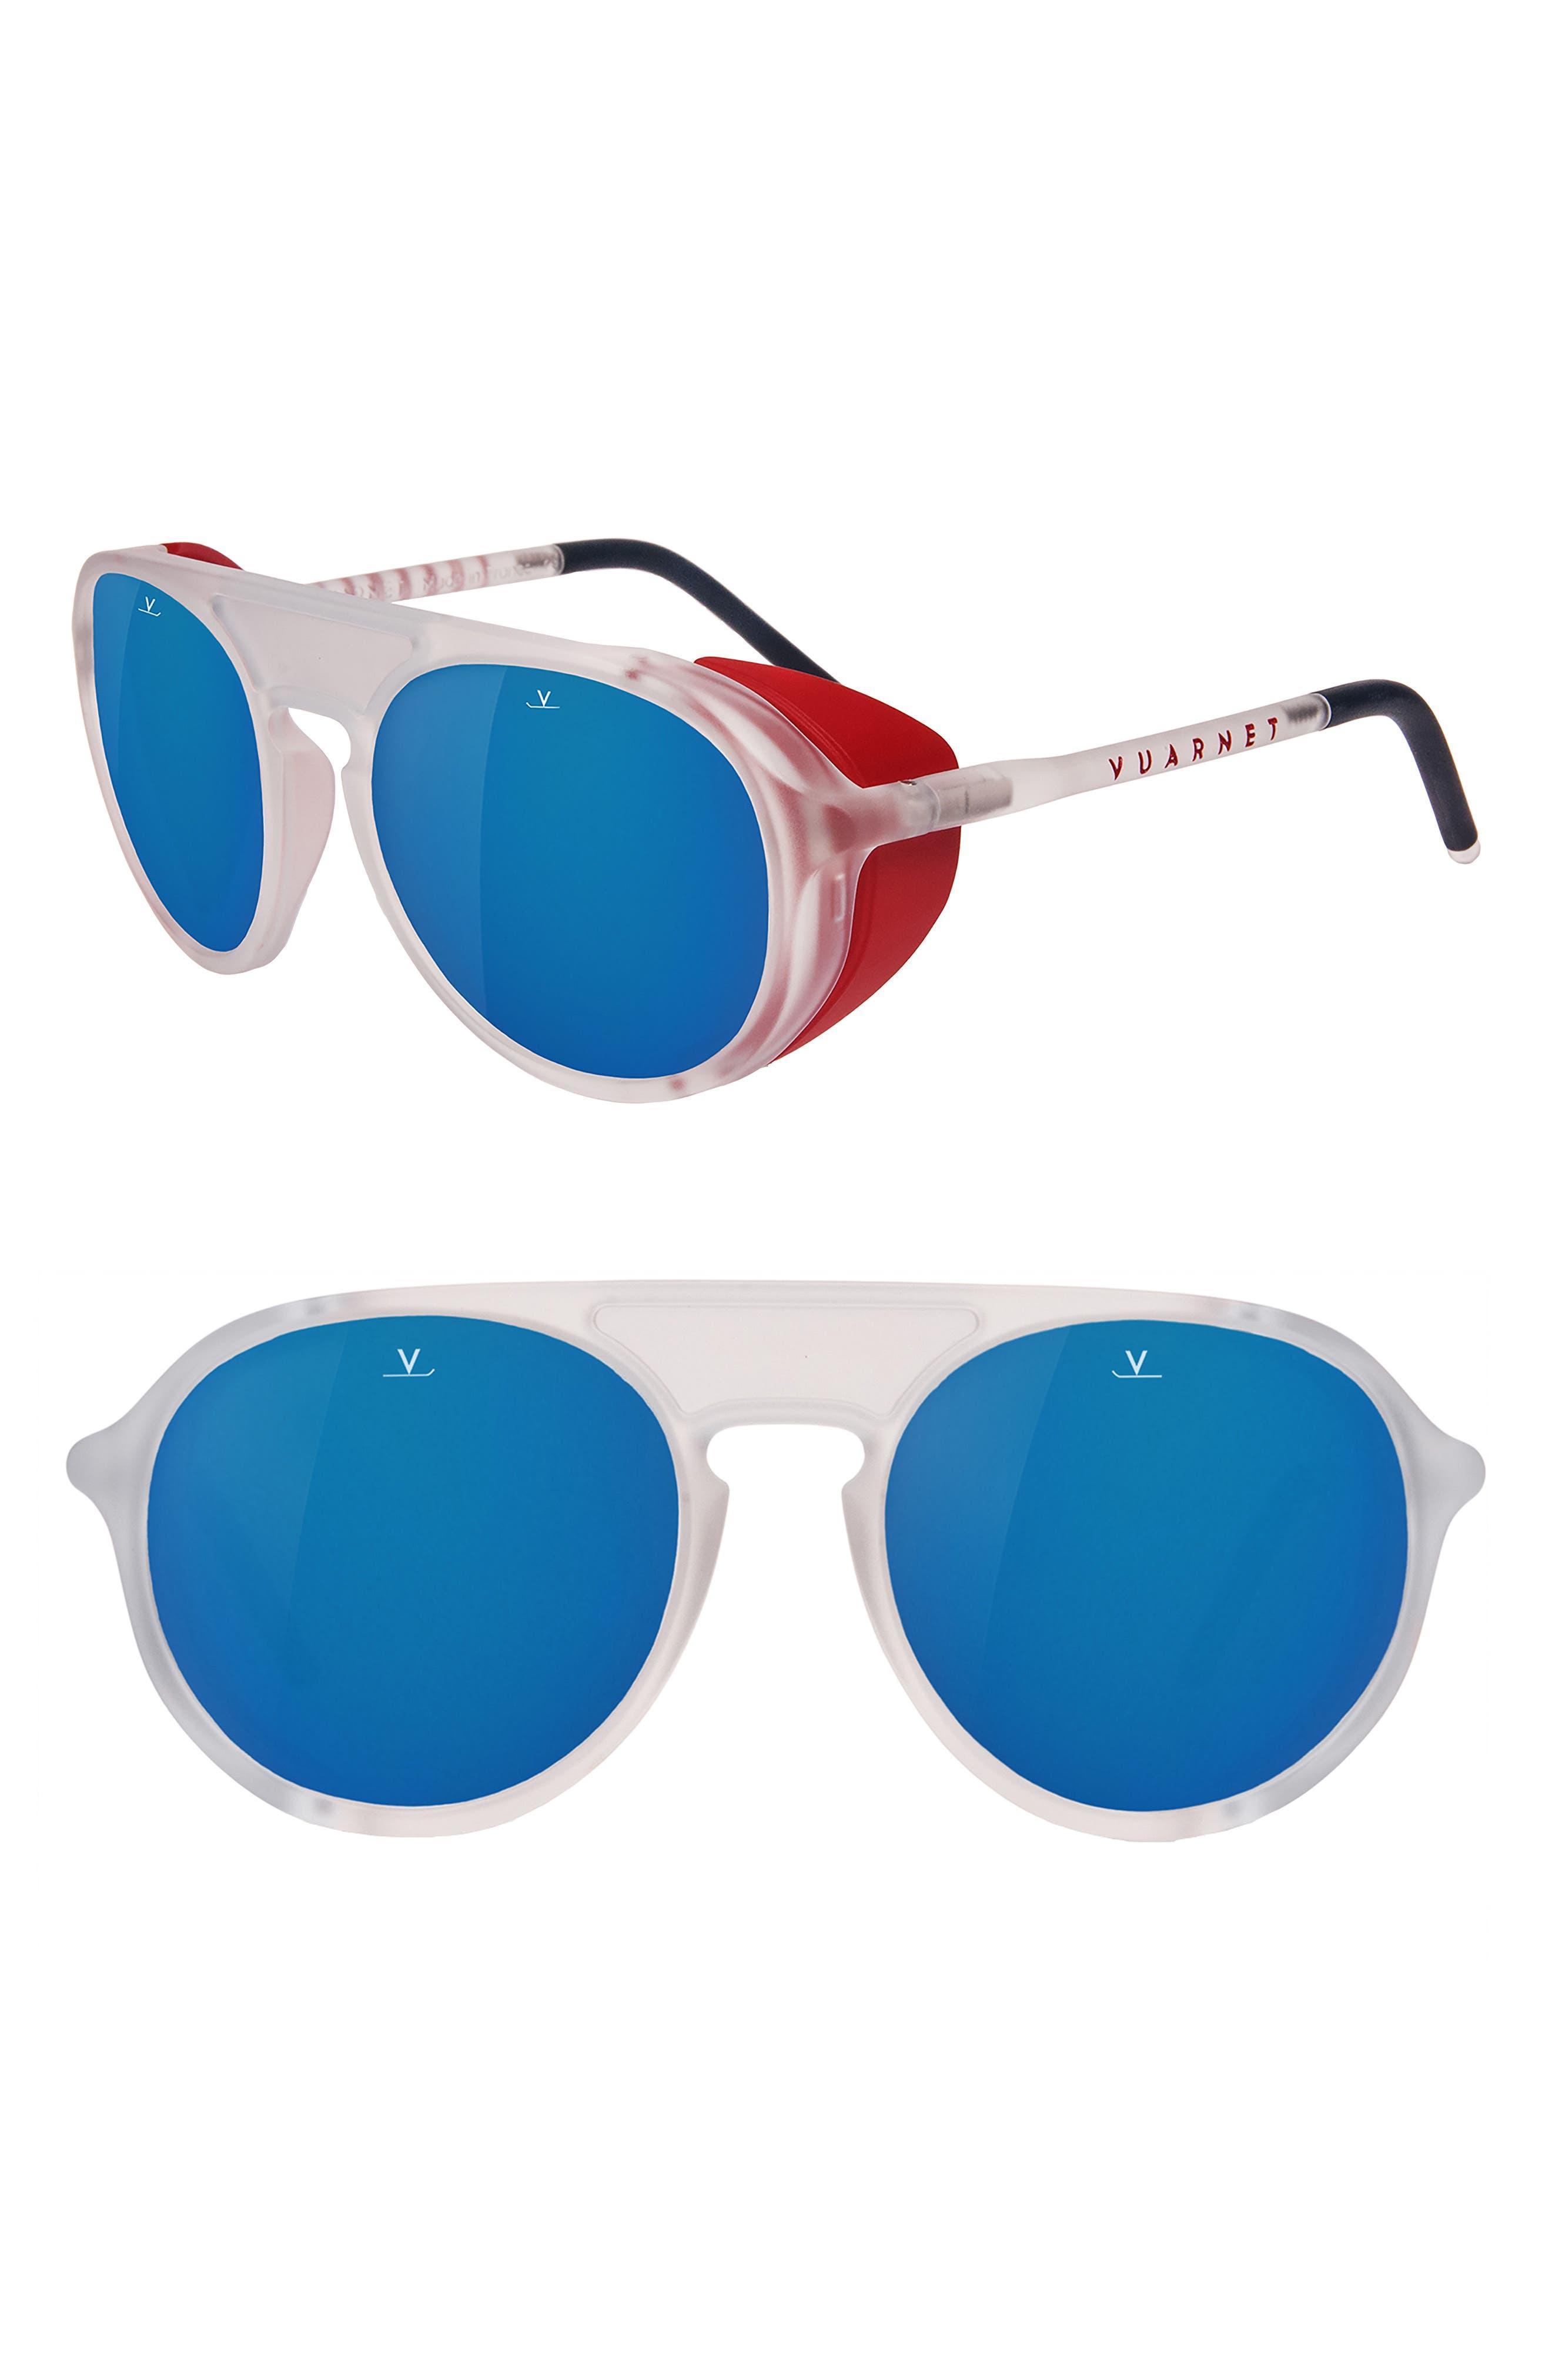 Ice 51mm Polarized Aviator Sunglasses,                             Main thumbnail 1, color,                             GREY POLAR BLUE FLASH